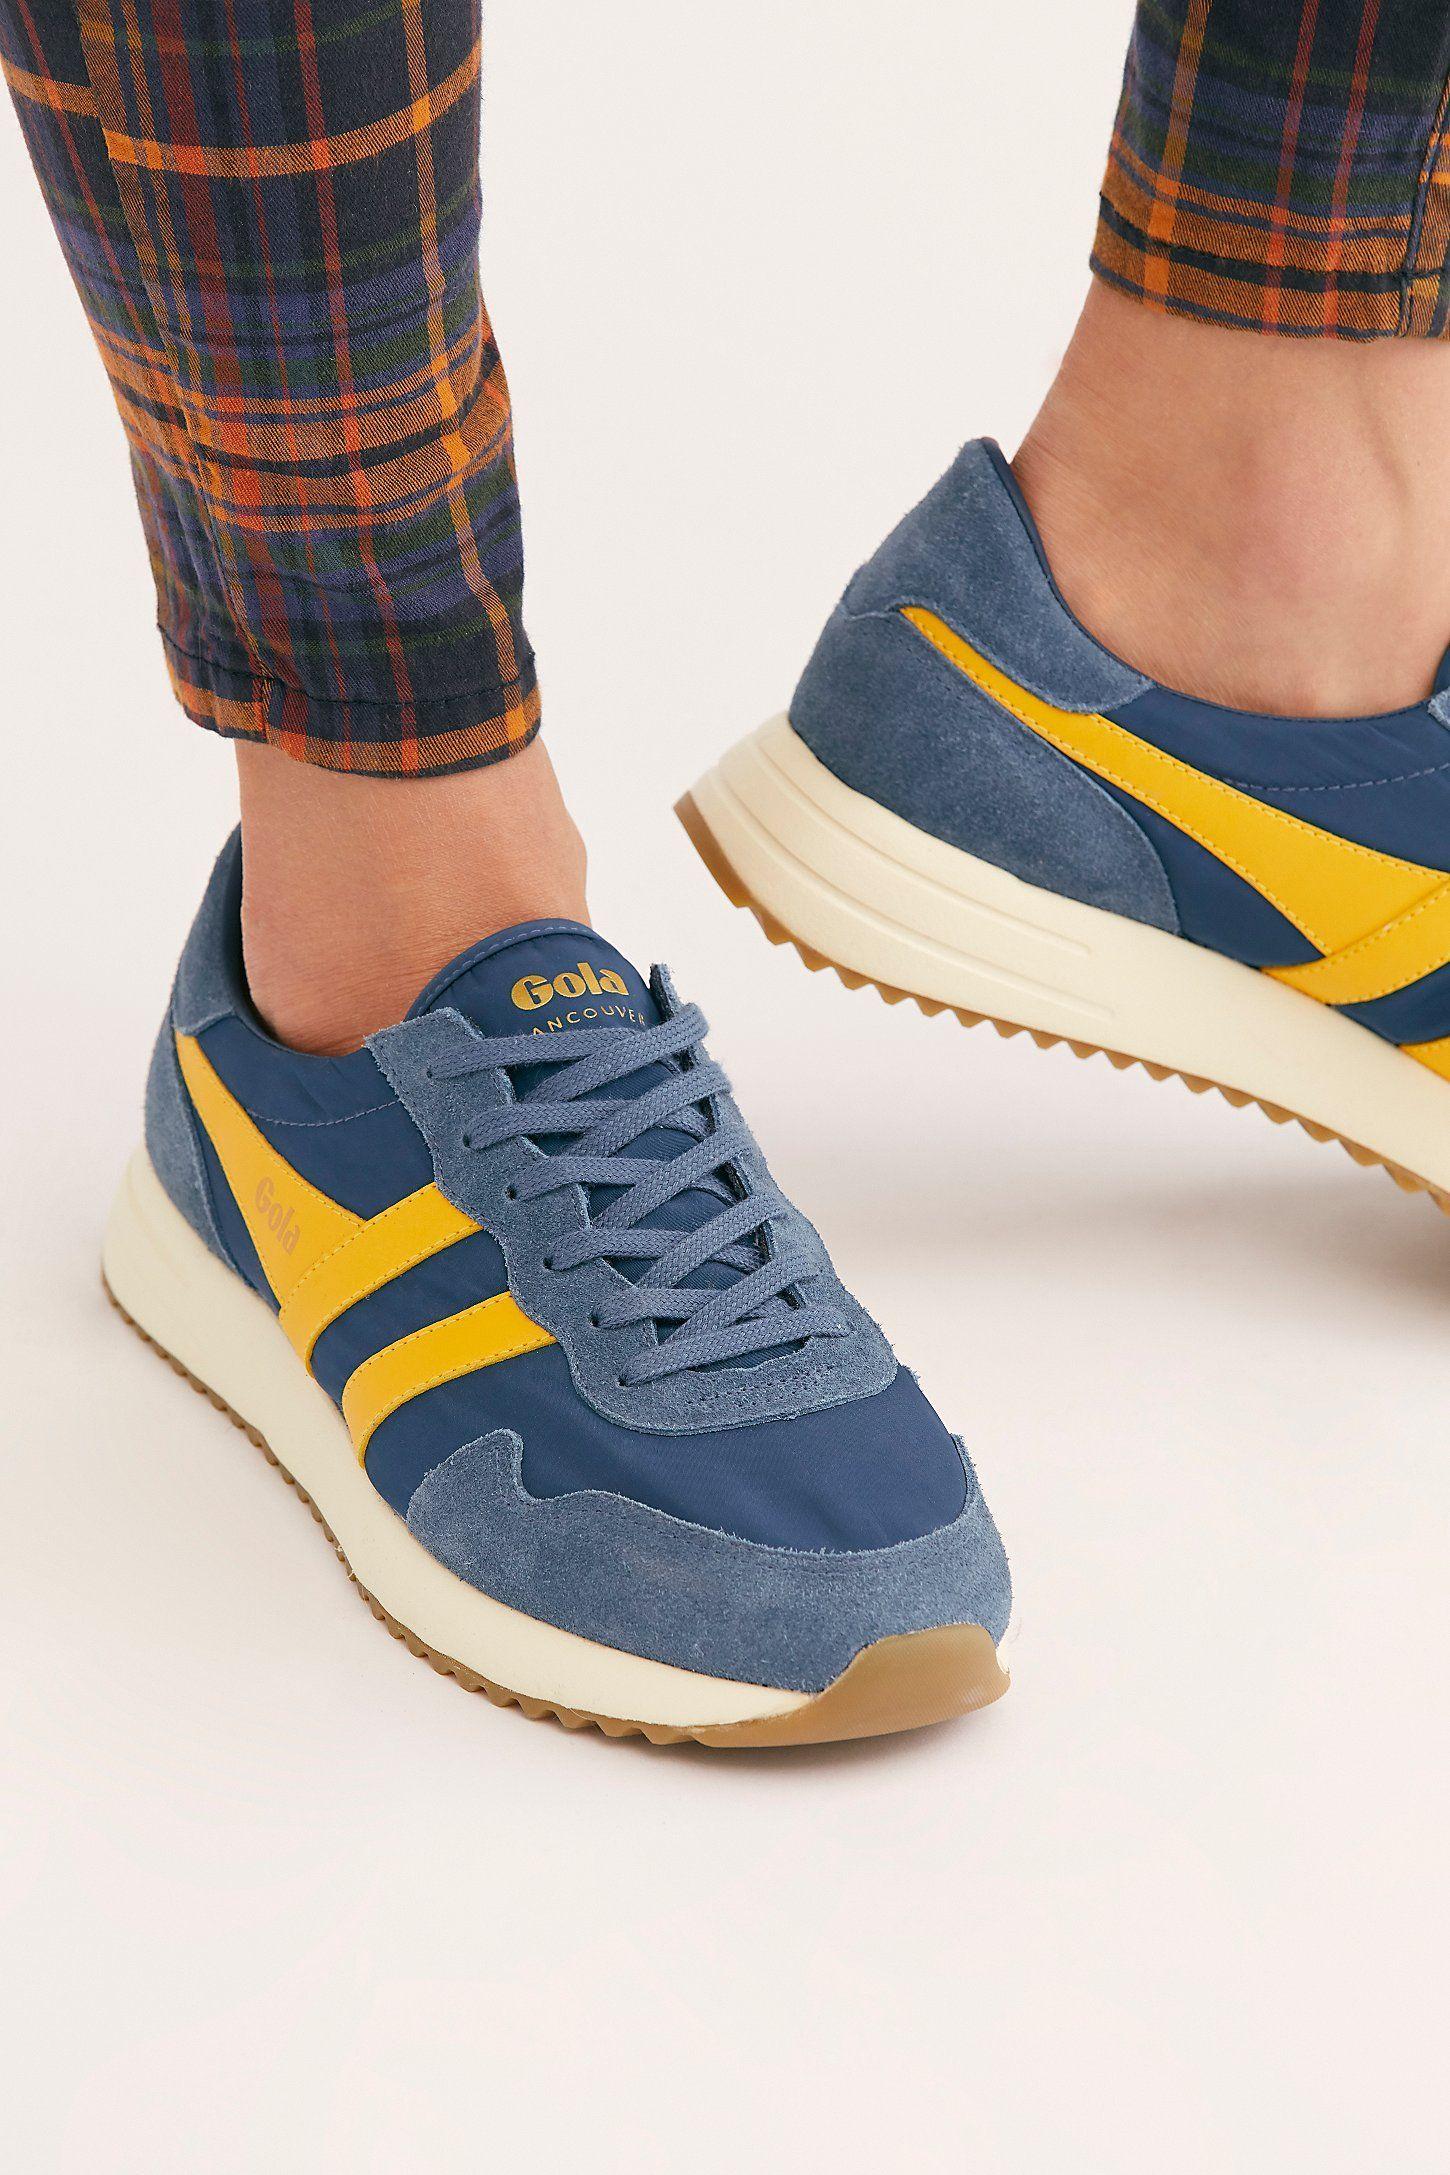 Gola Vancouver Sneaker Free People Retro Sneakers Women Sneakers Retro Sneakers